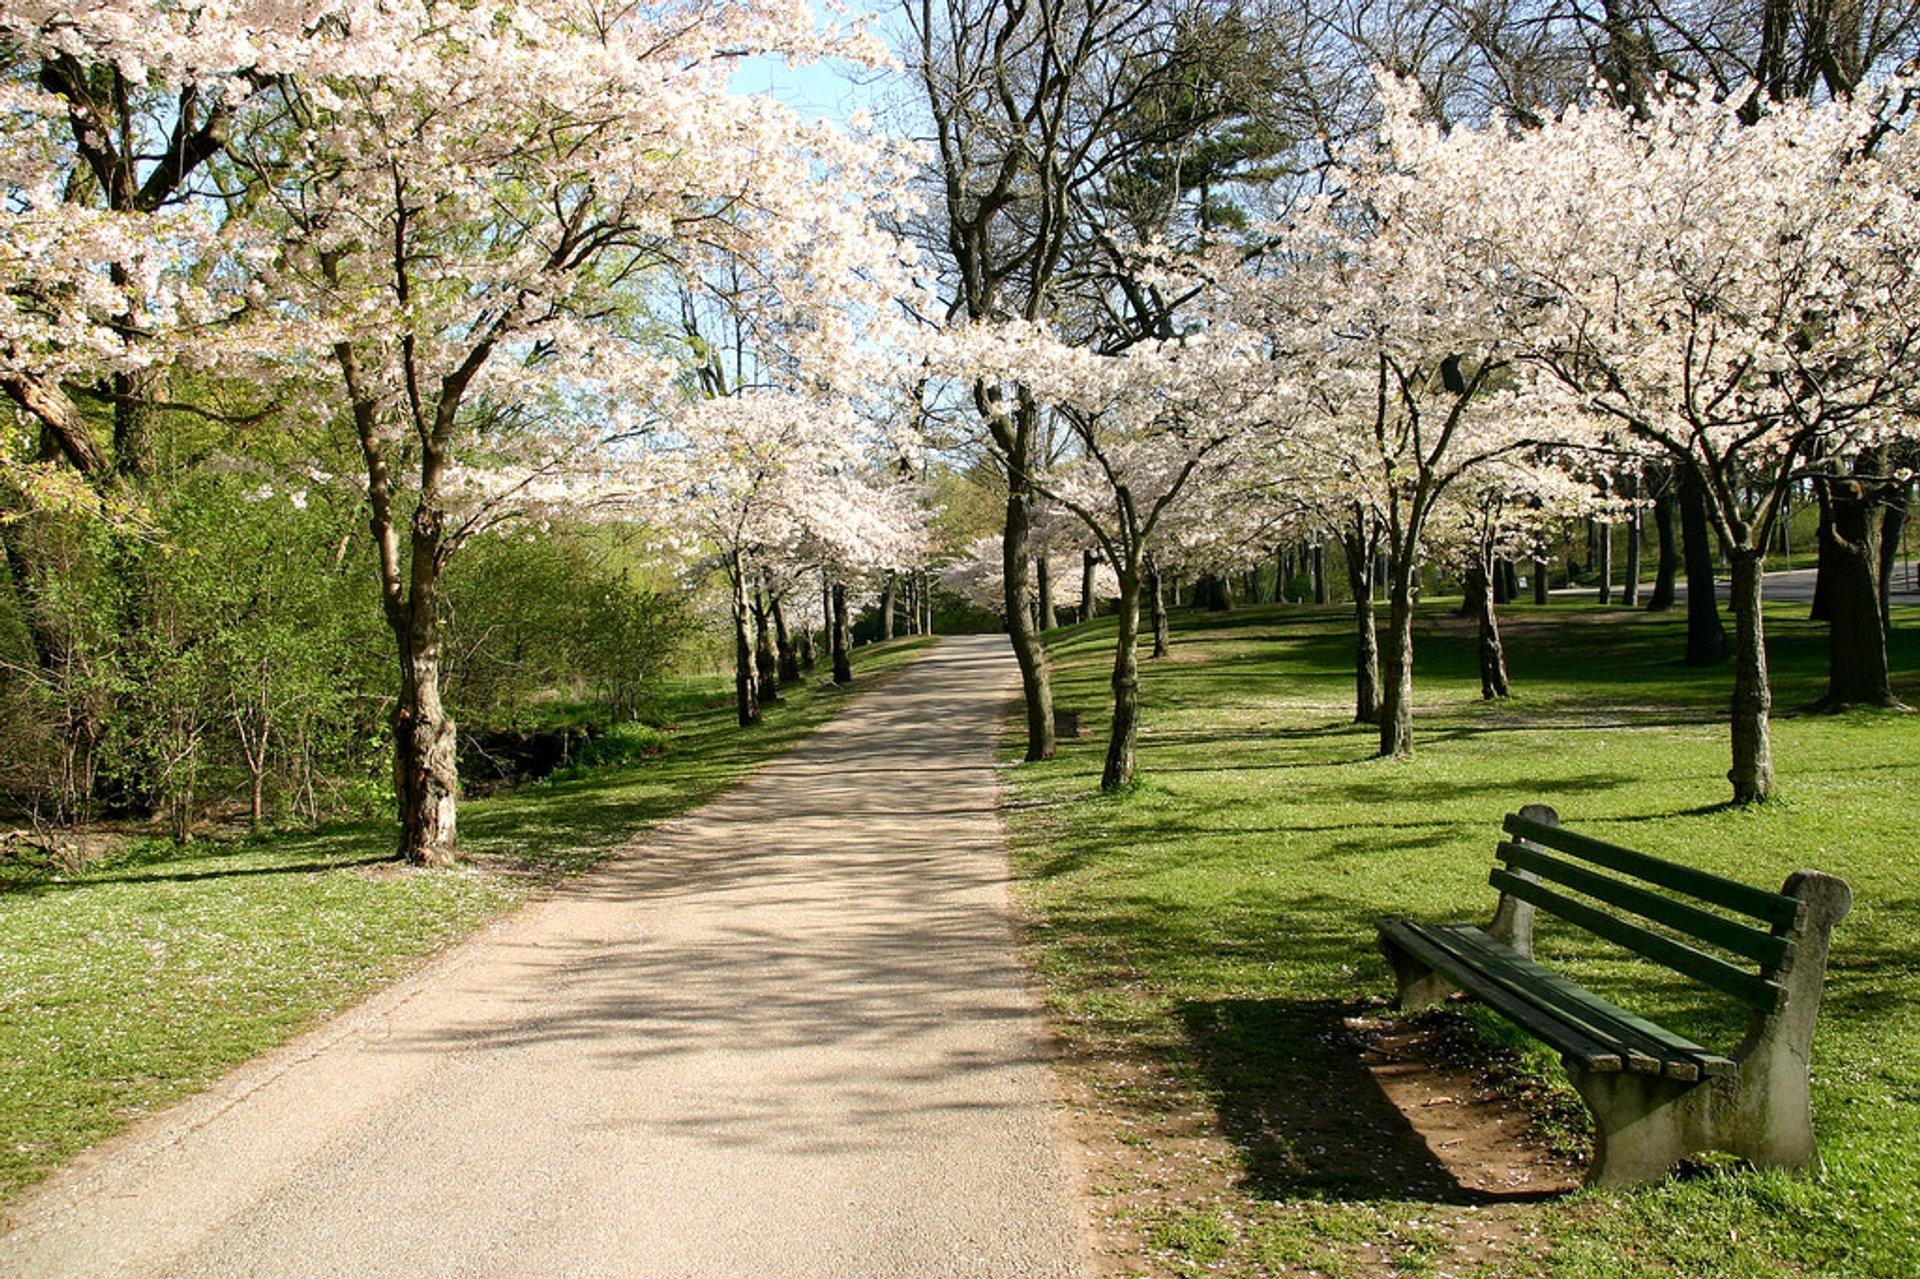 High Park cherry blossoms 2020